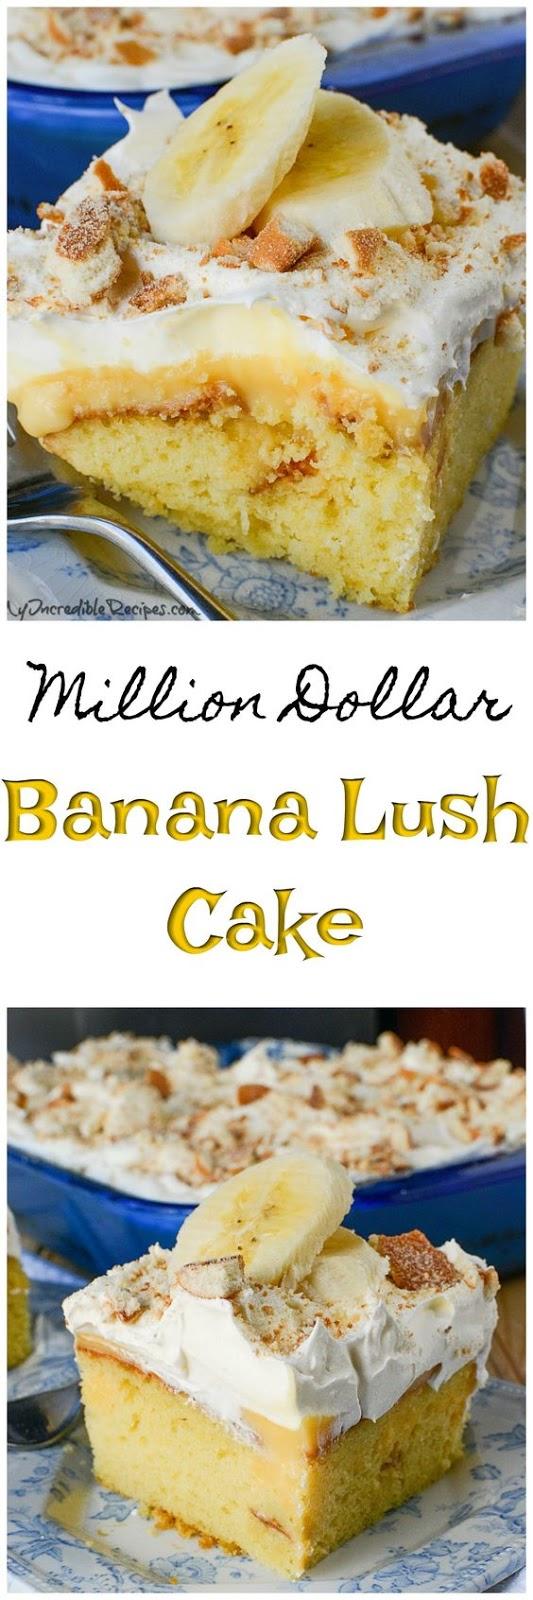 Banana Pudding Lush Cake